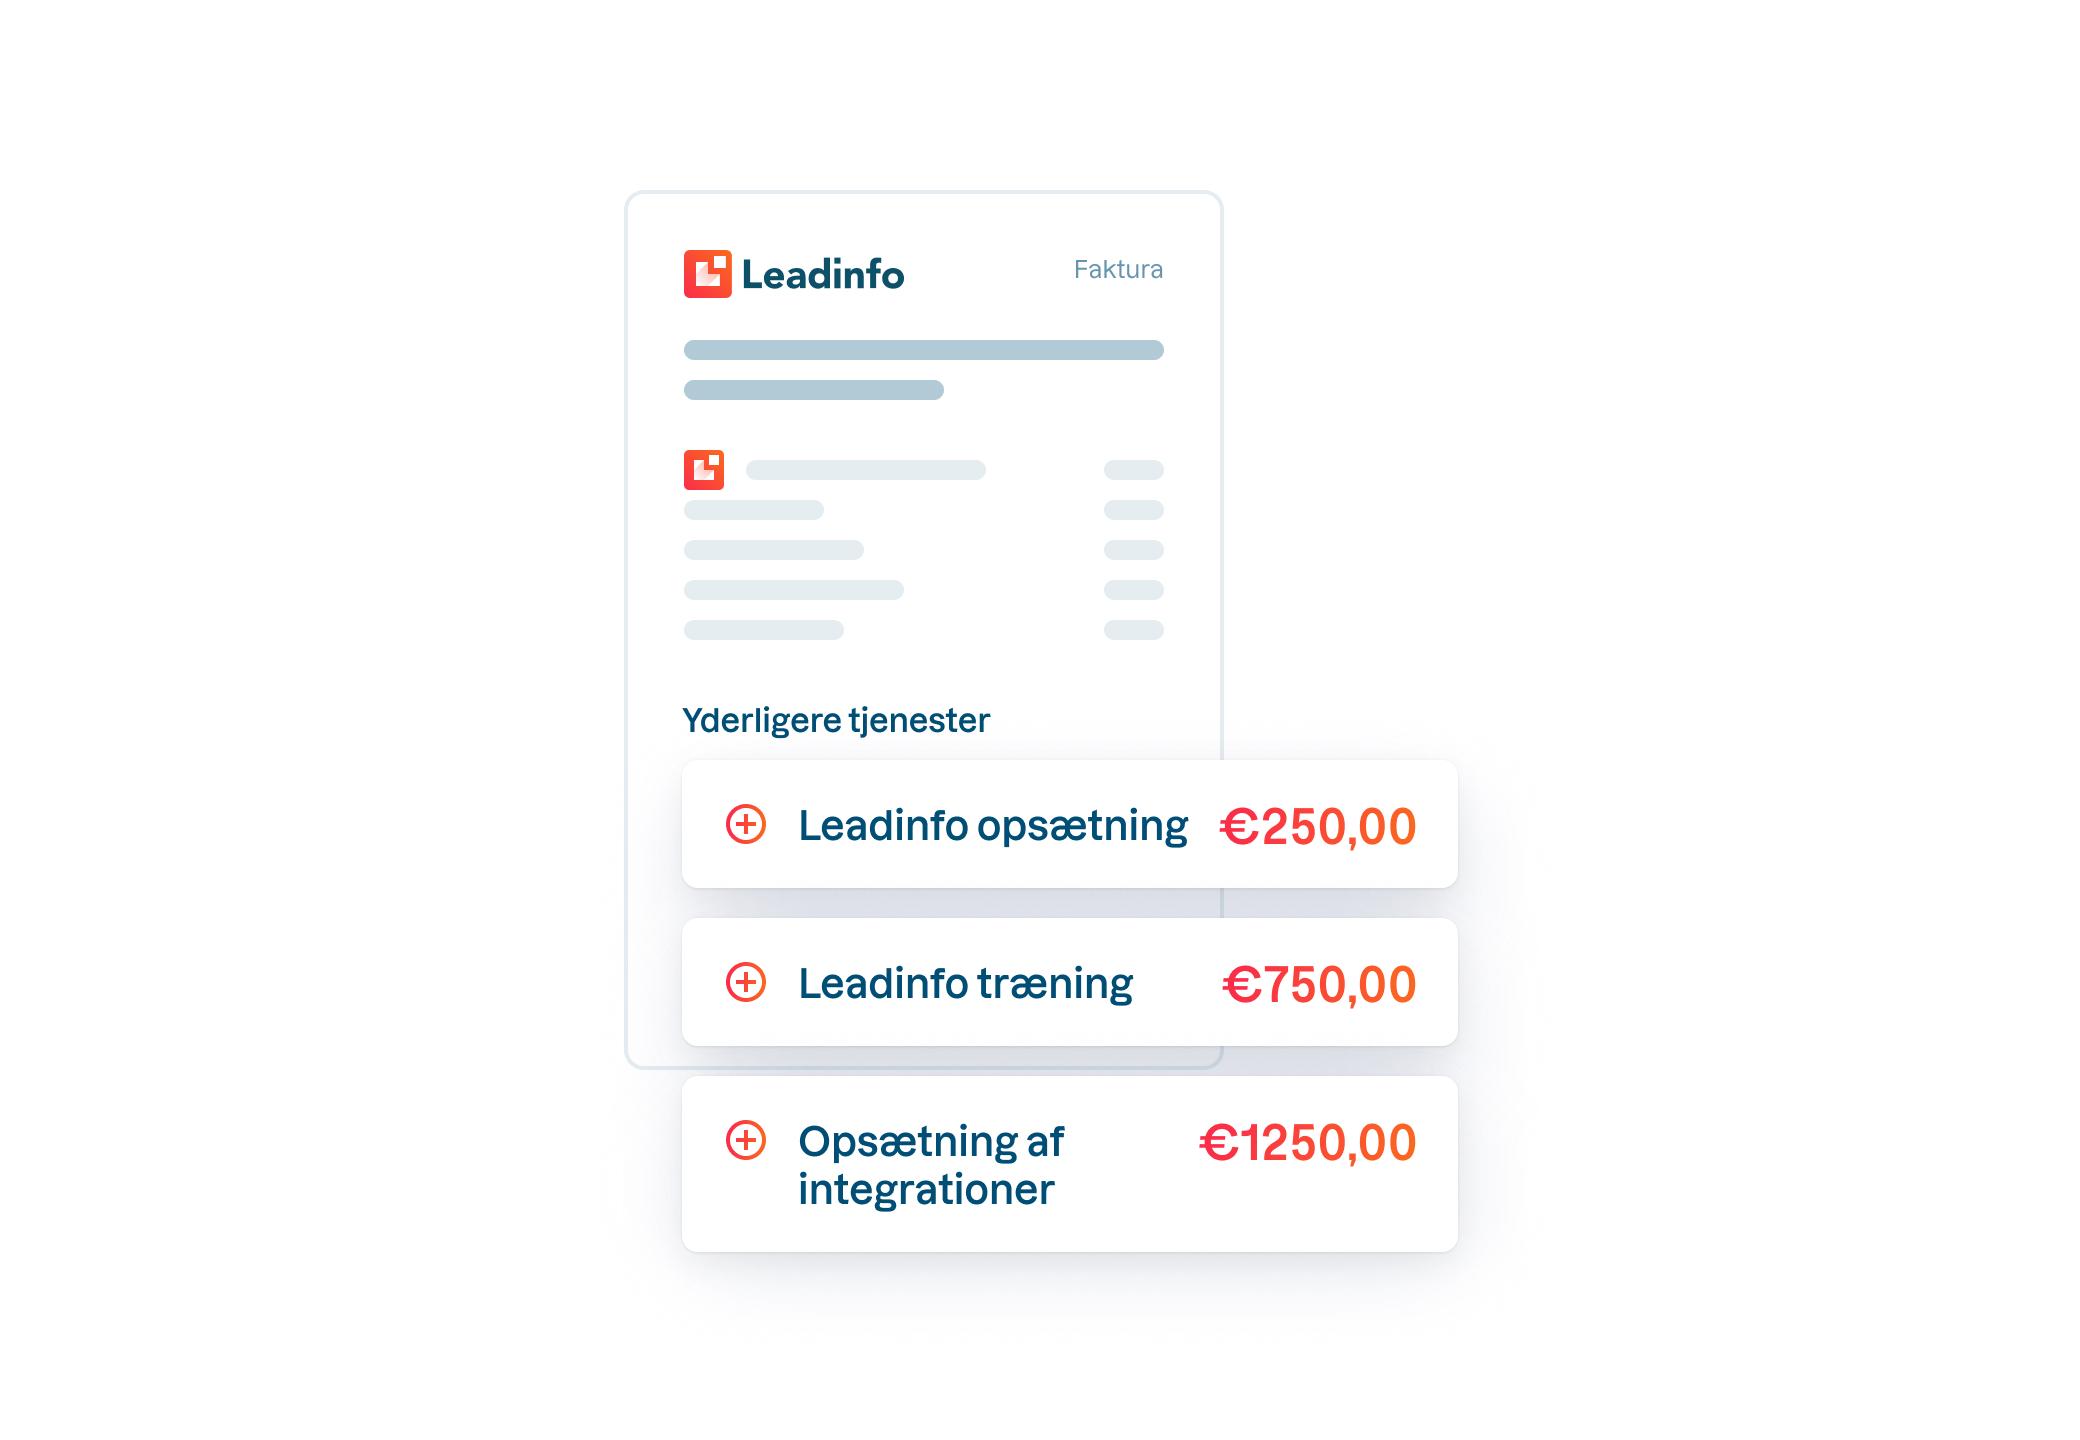 revenue-additional-services-DK